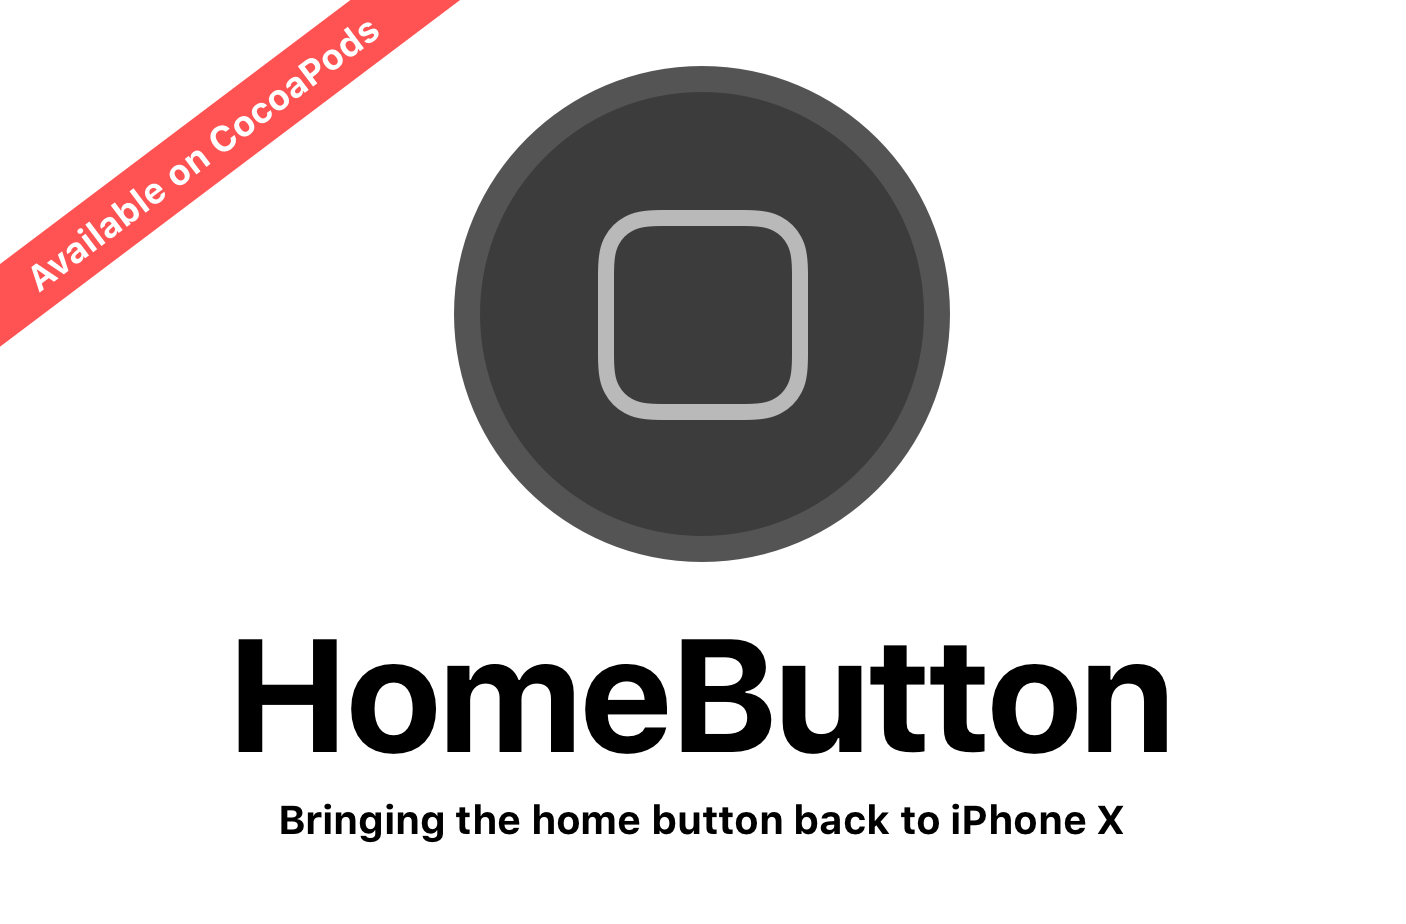 Home Button Title Graphic